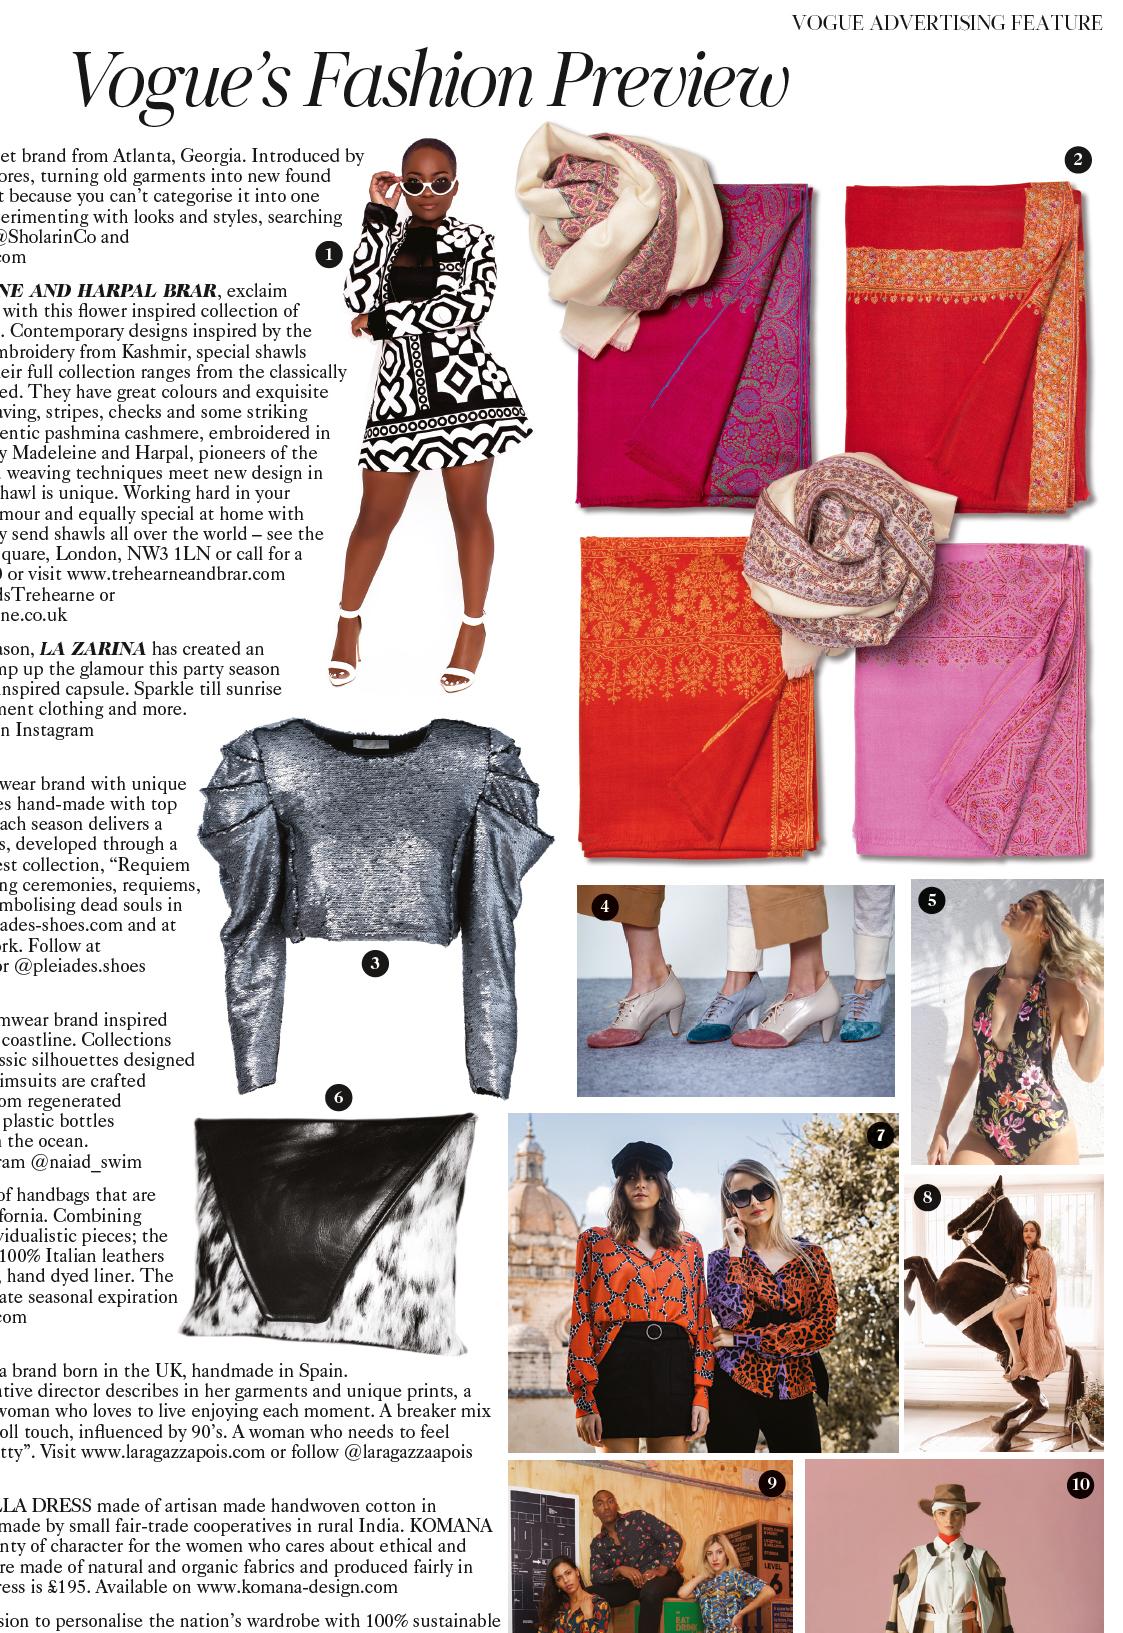 04APR-Vogue's Fashion Preview copy.jpg